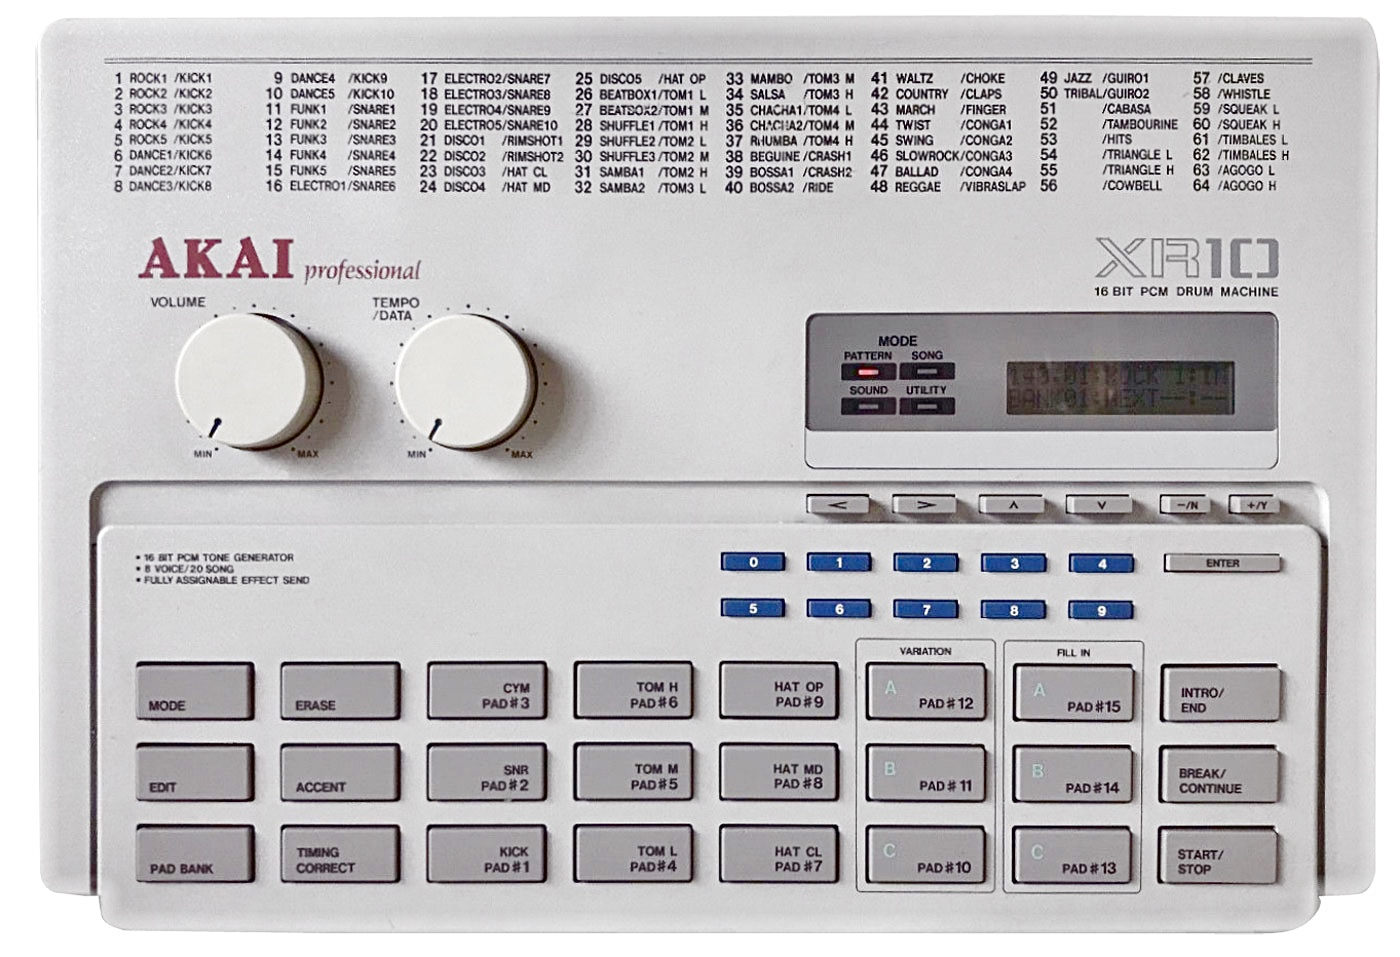 https://medias.audiofanzine.com/images/normal/fonctionnalites-audiofanzine-3164310.jpeg